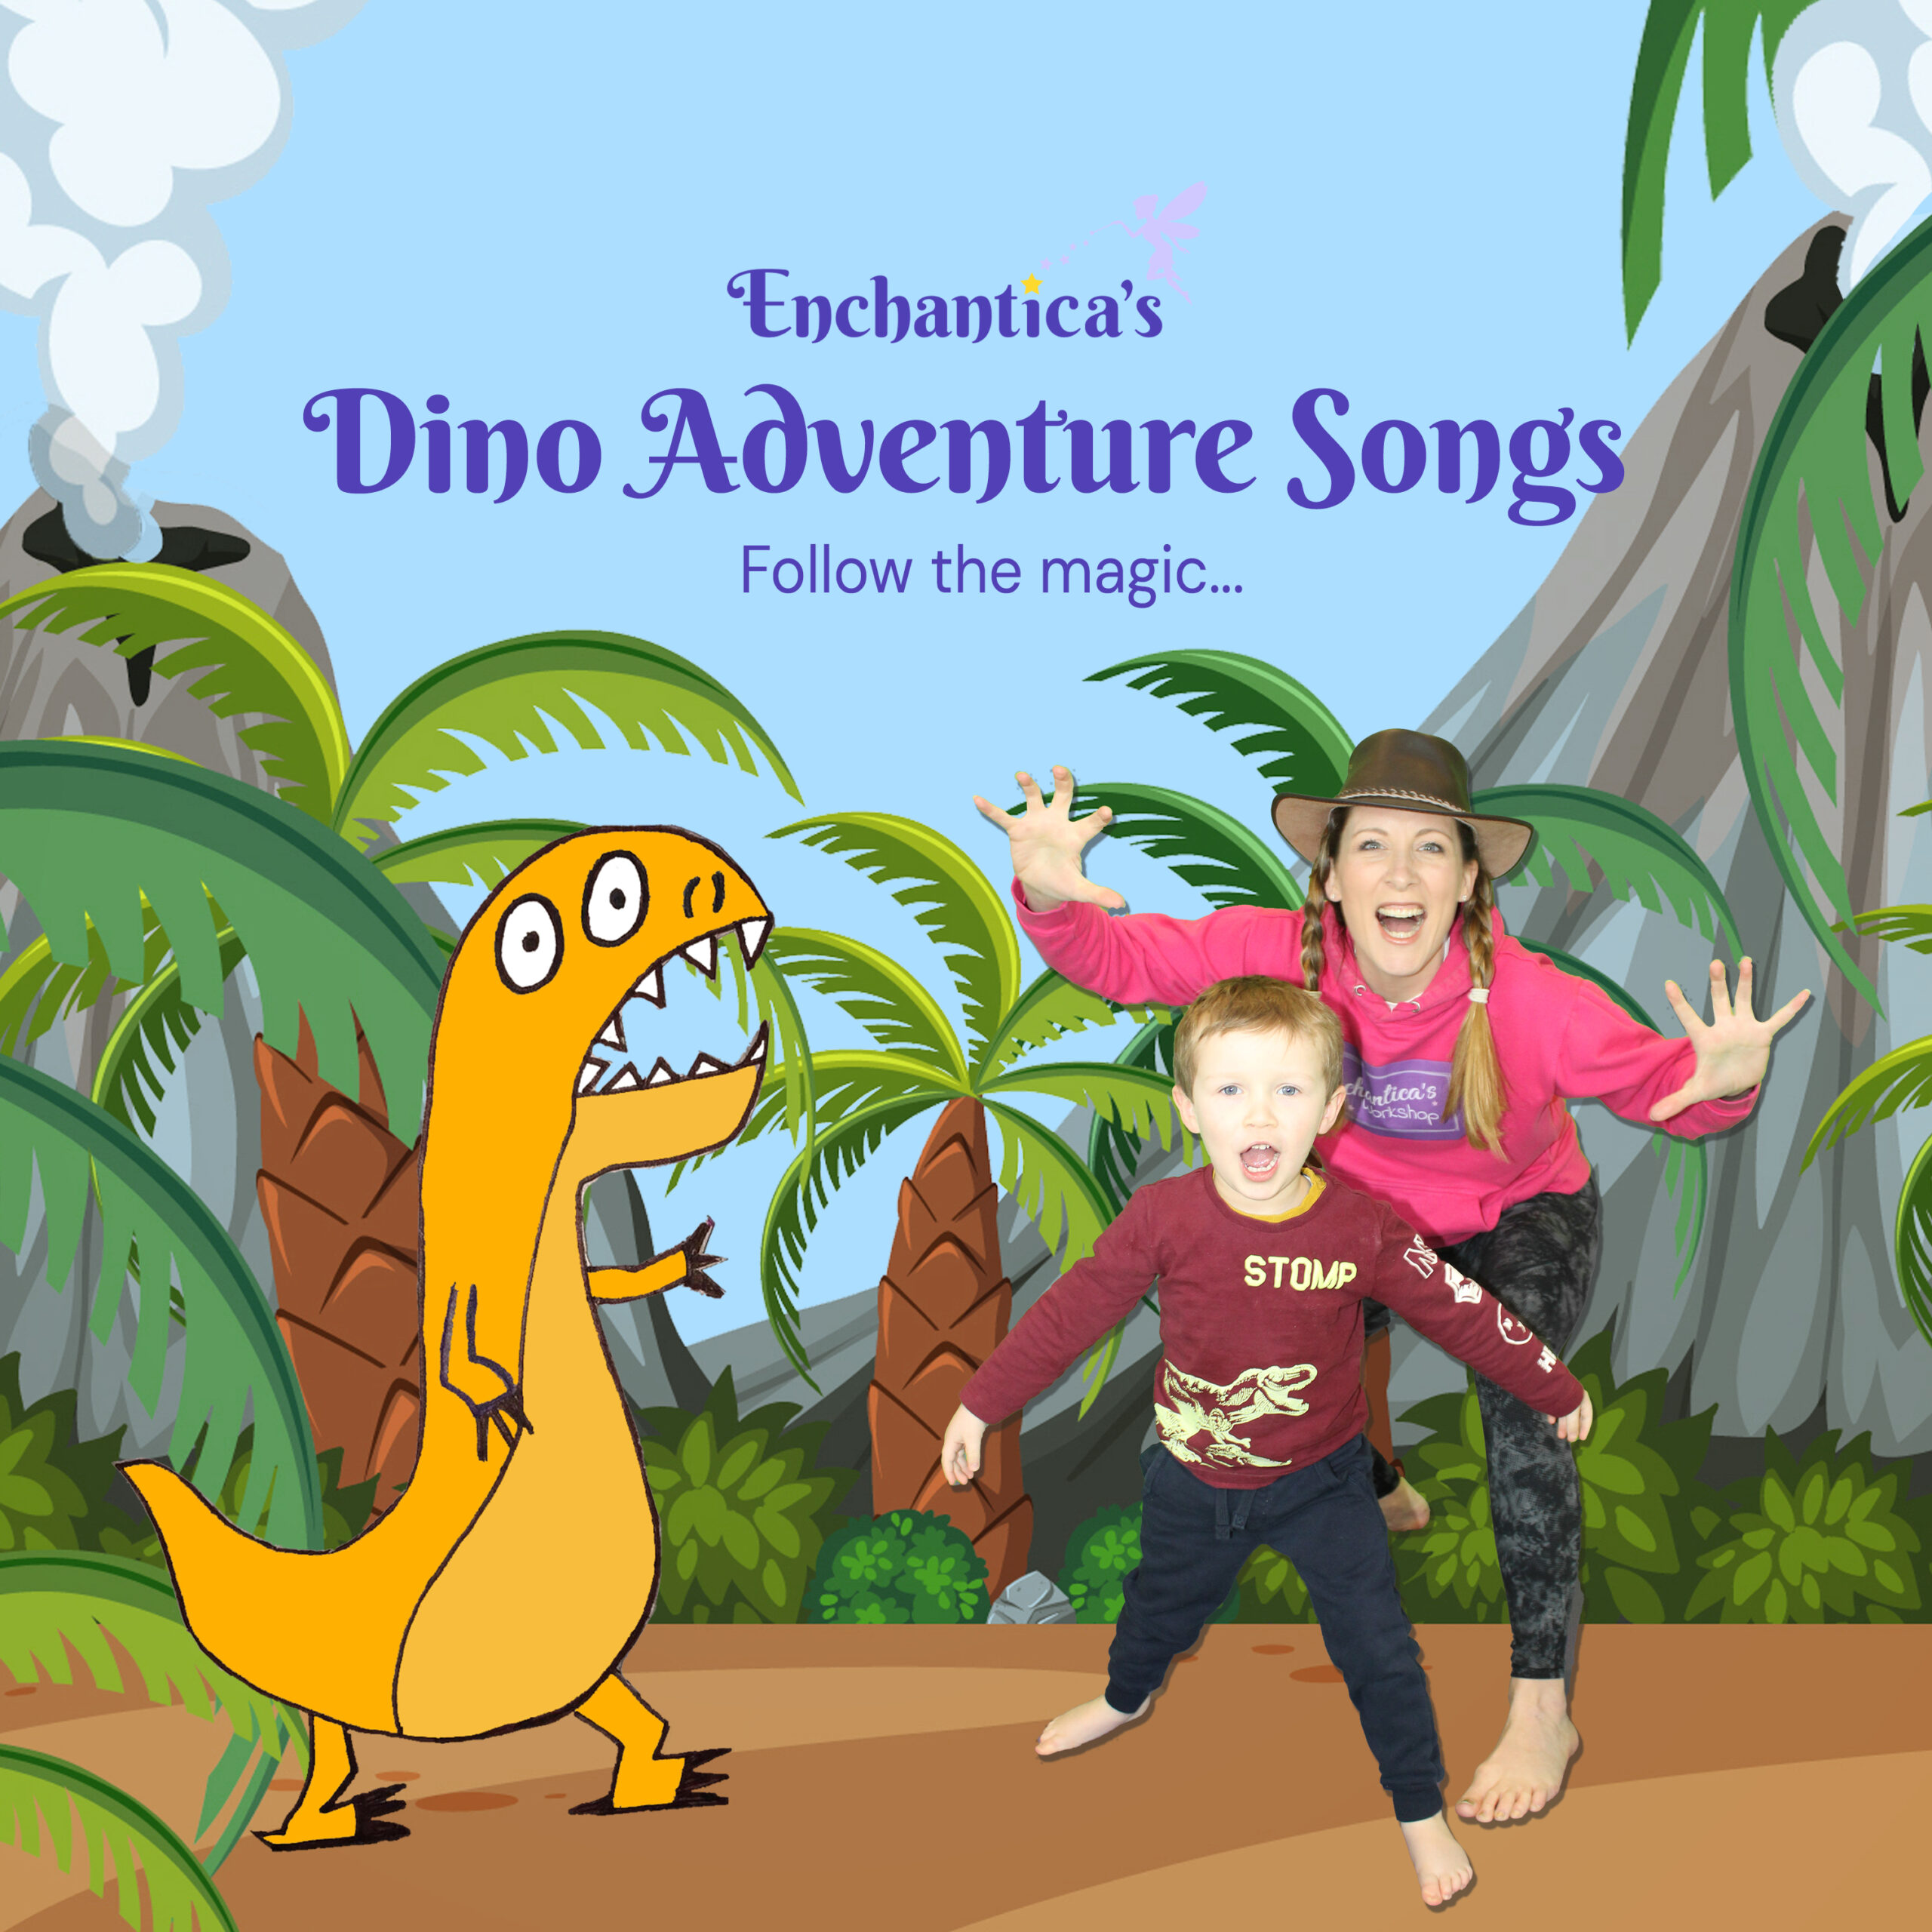 Enchantica's Dino Adventure Songs